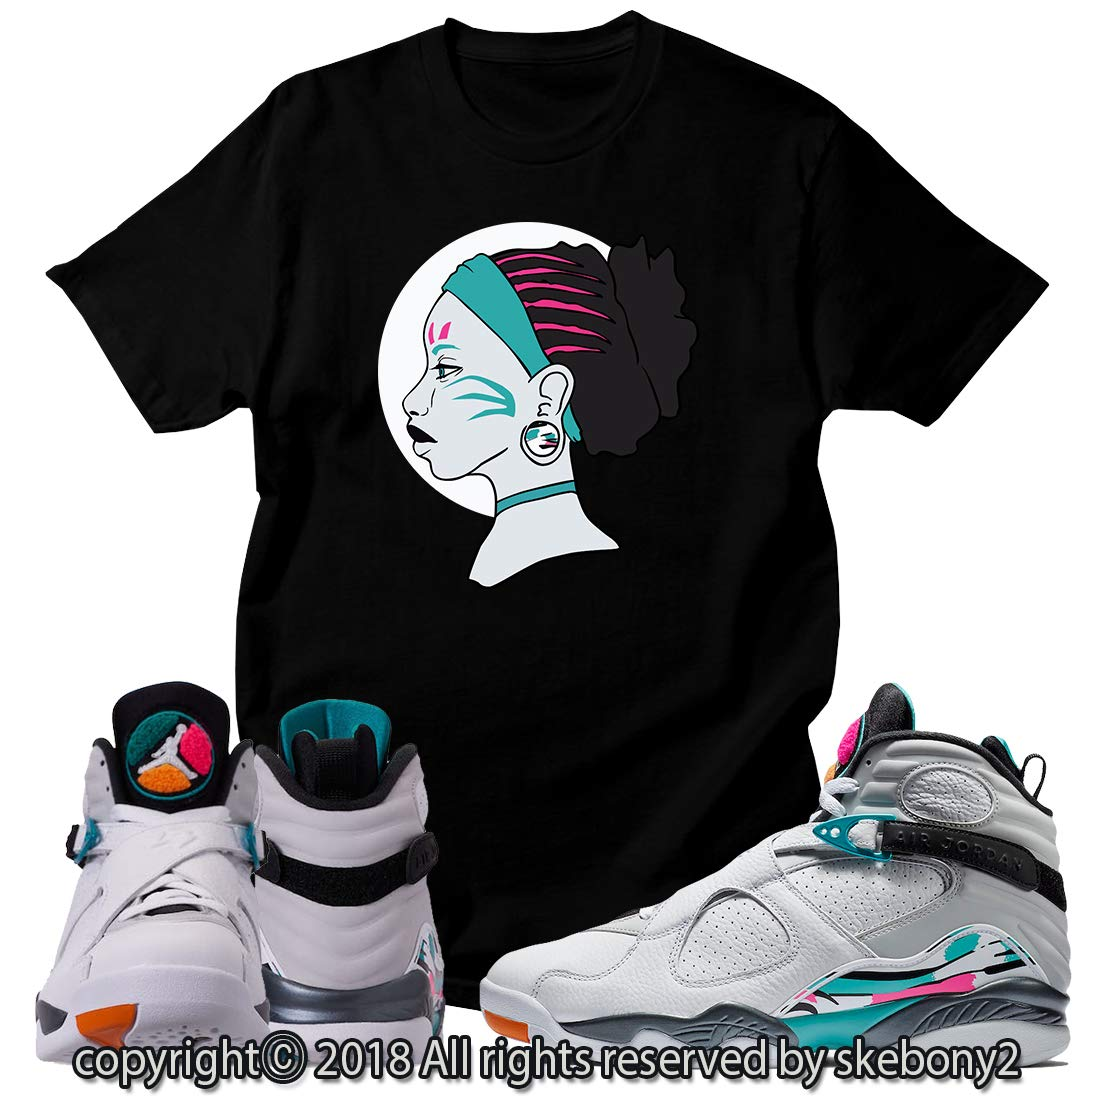 detailed look 9ebe1 dbbad Custom T Shirt Matching Style of Air Jordan 8 South Beach JD ...